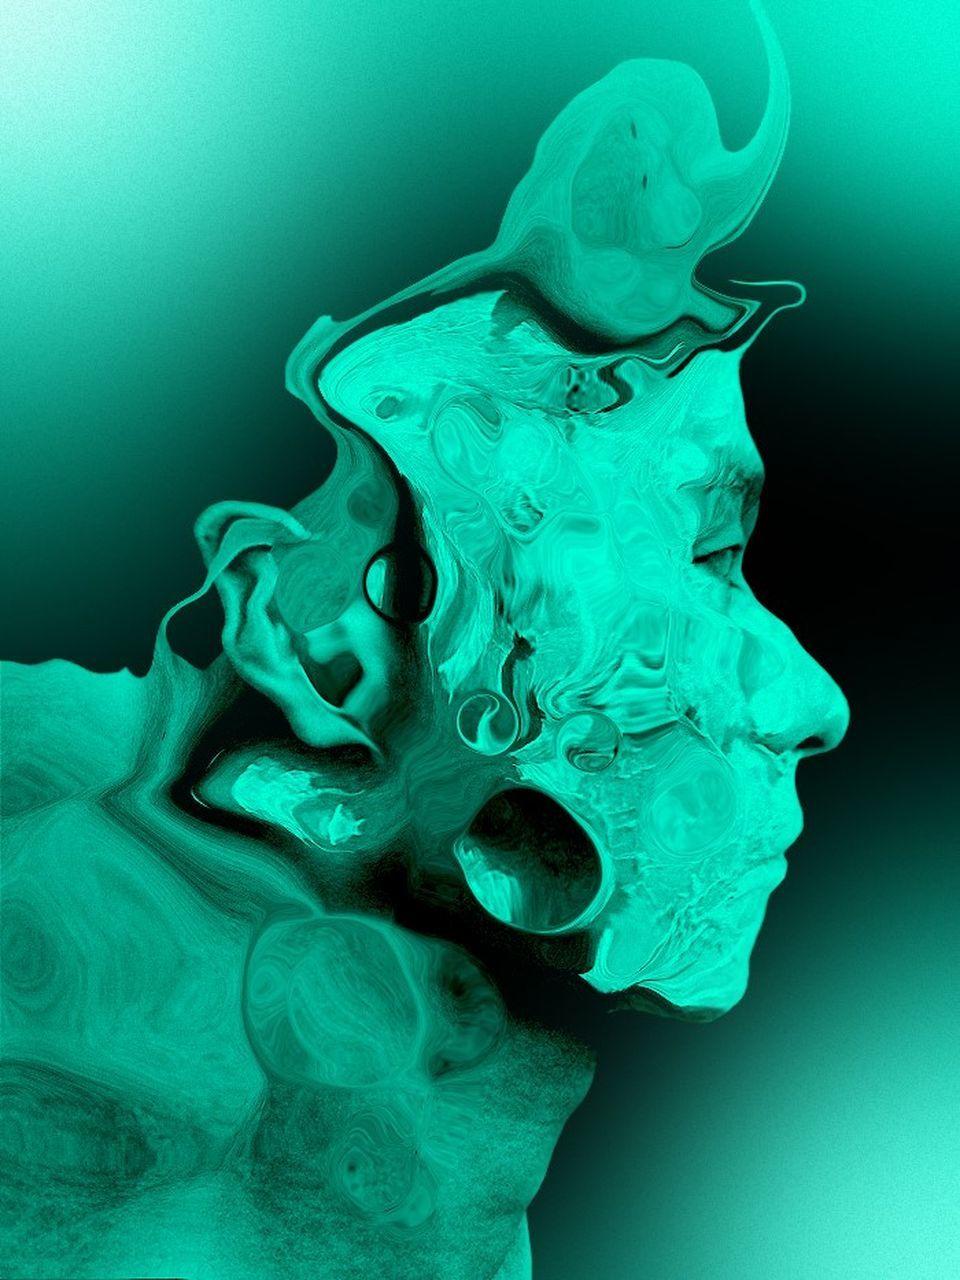 green color, statue, sculpture, close-up, no people, studio shot, indoors, day